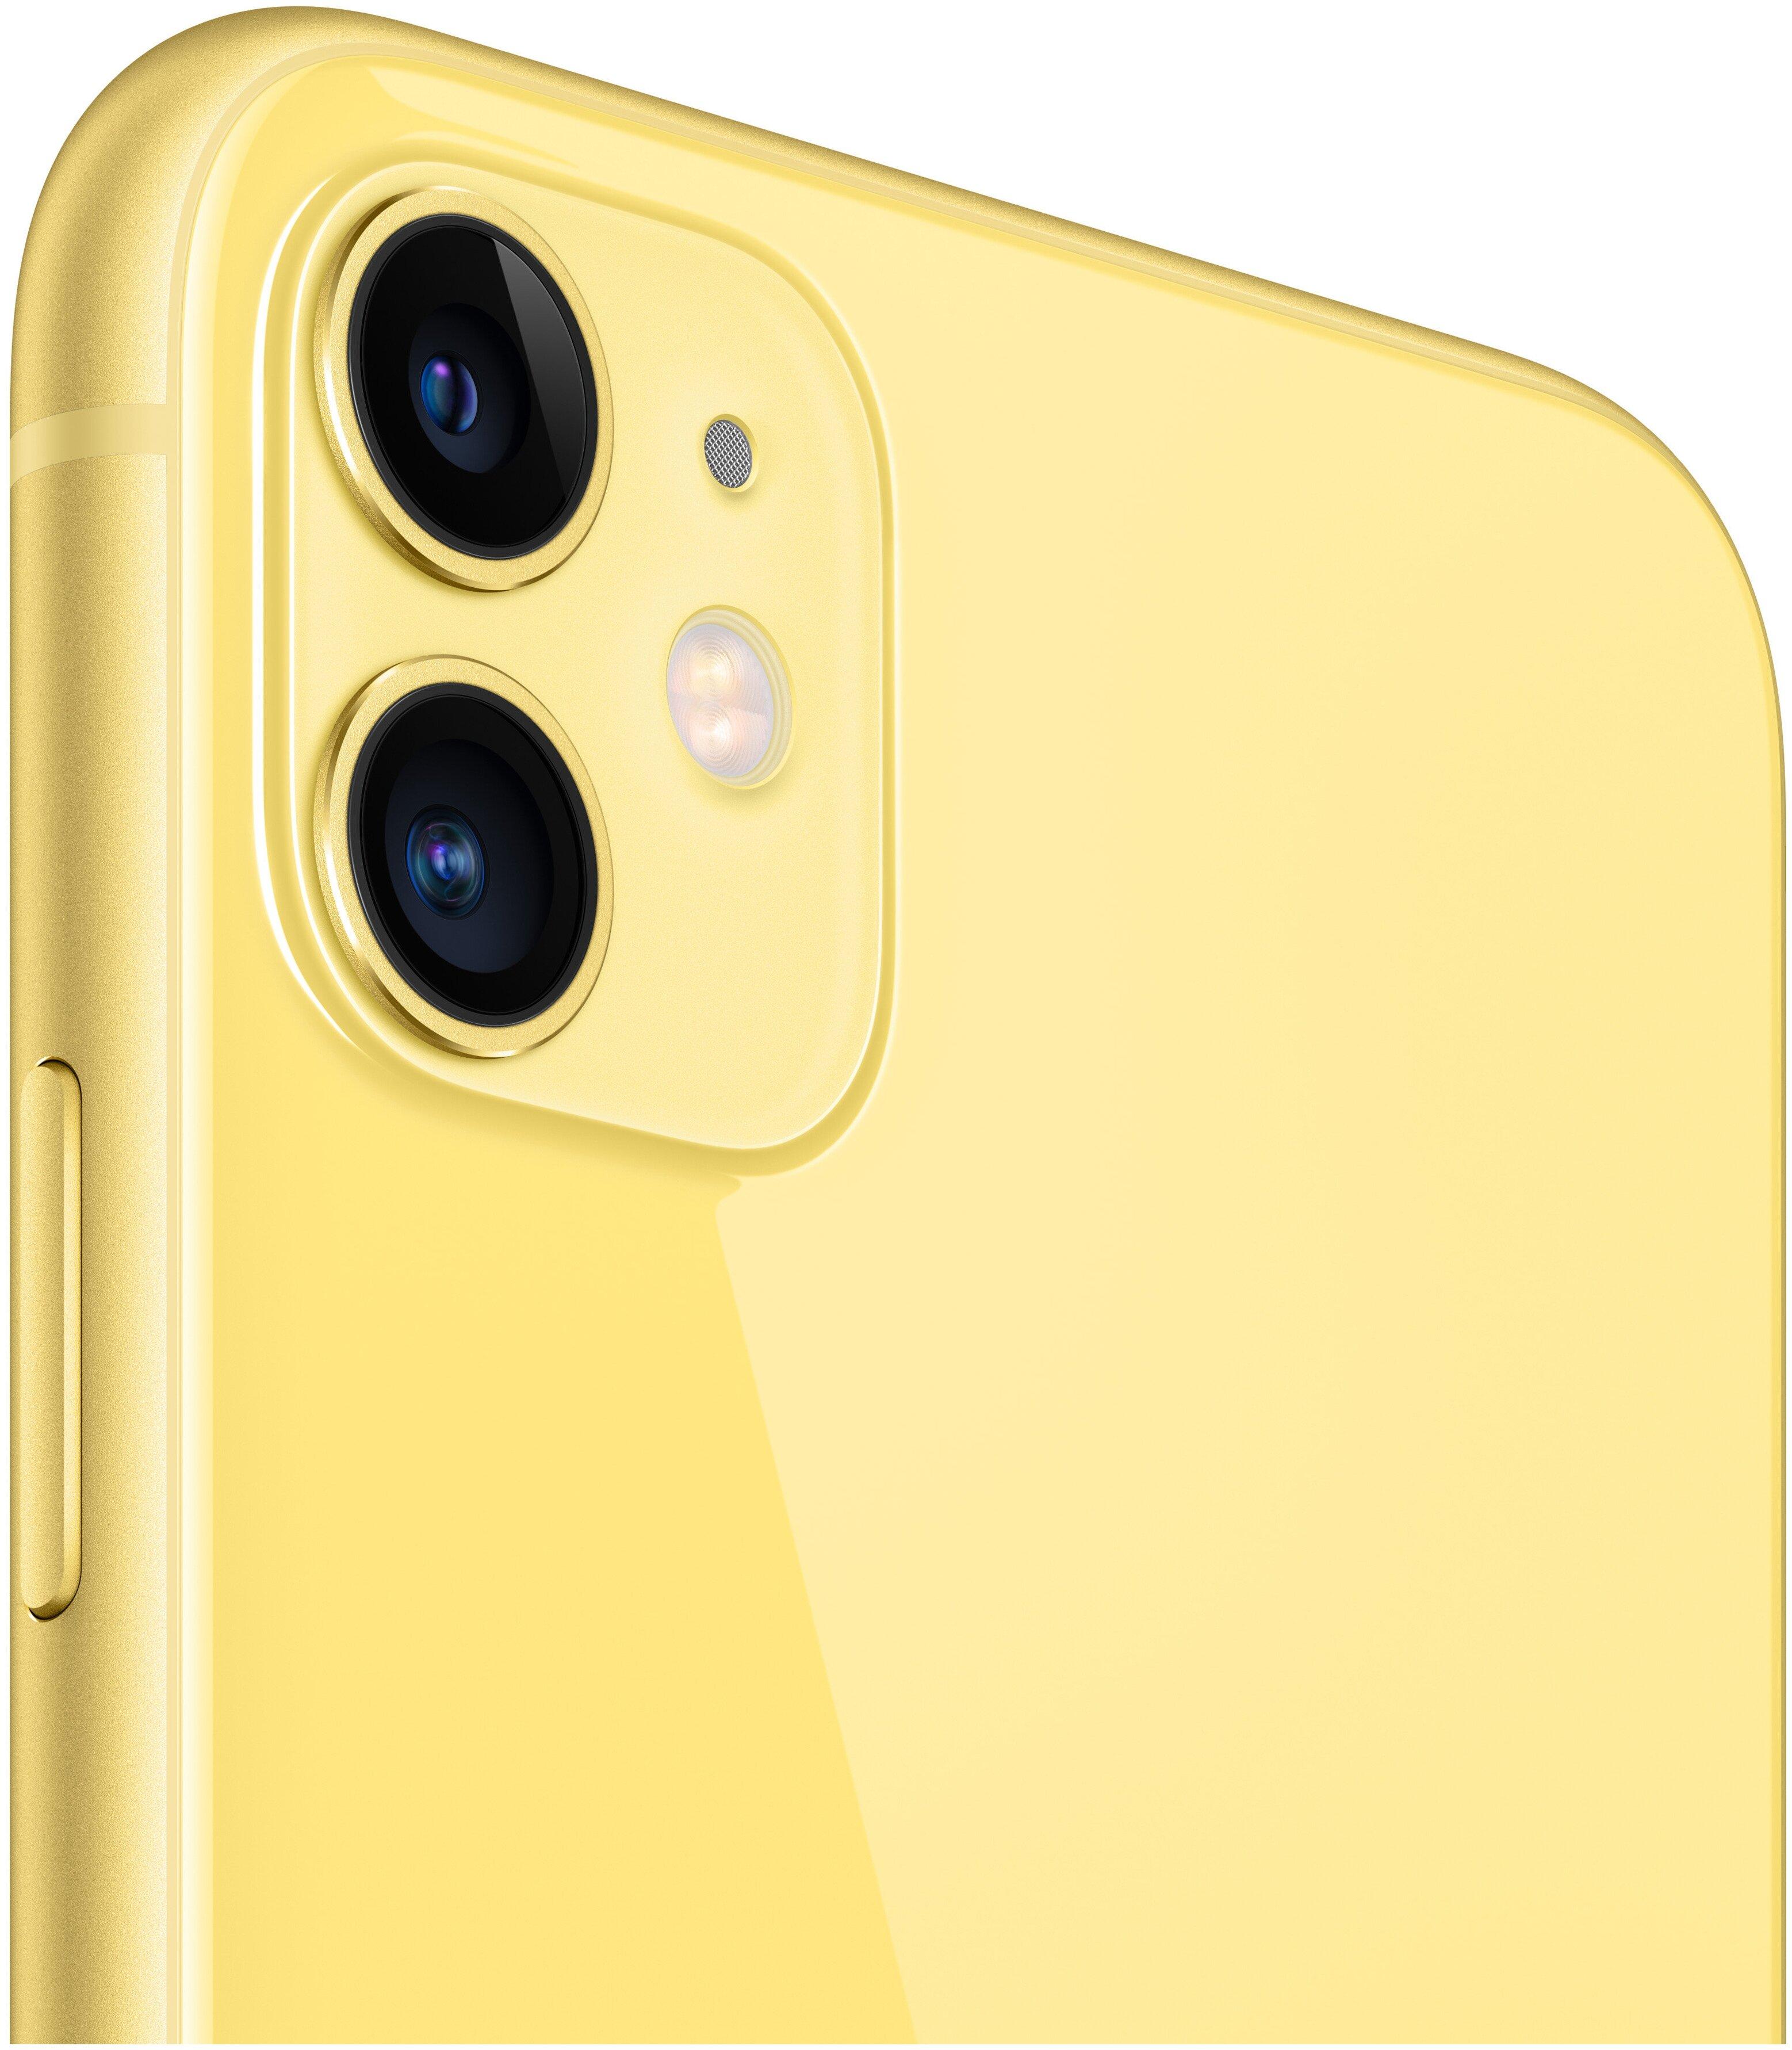 Apple iPhone 11 64GB - операционная система: iOS 13